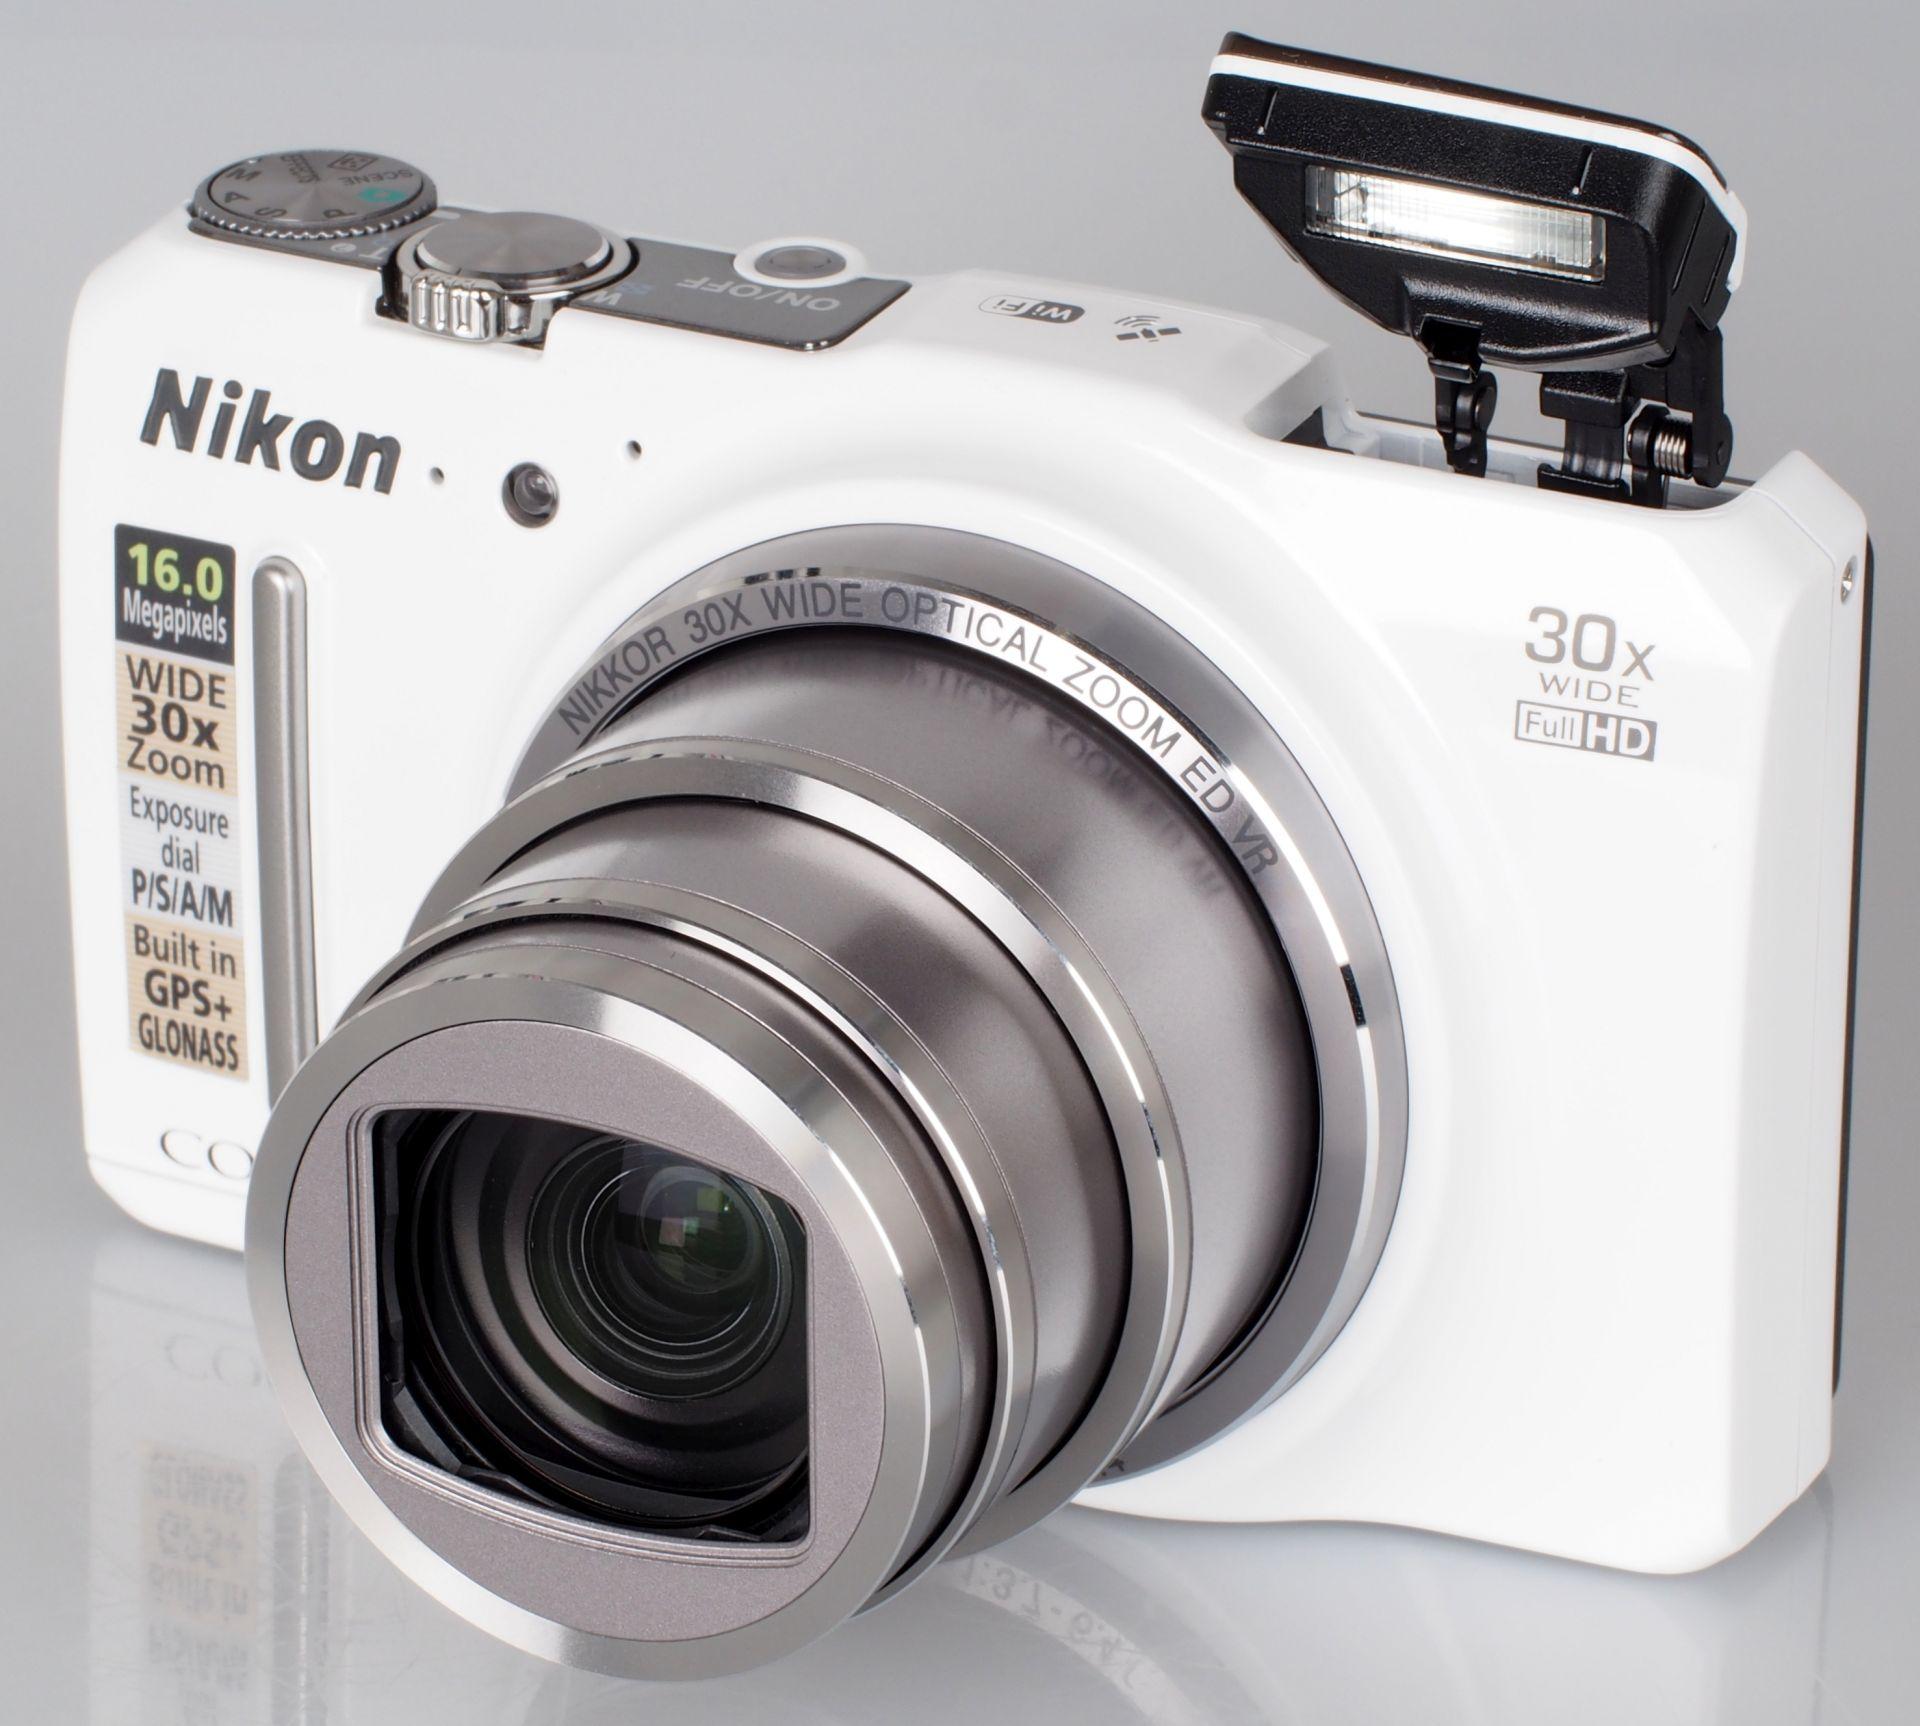 nikon coolpix s9700 instructions